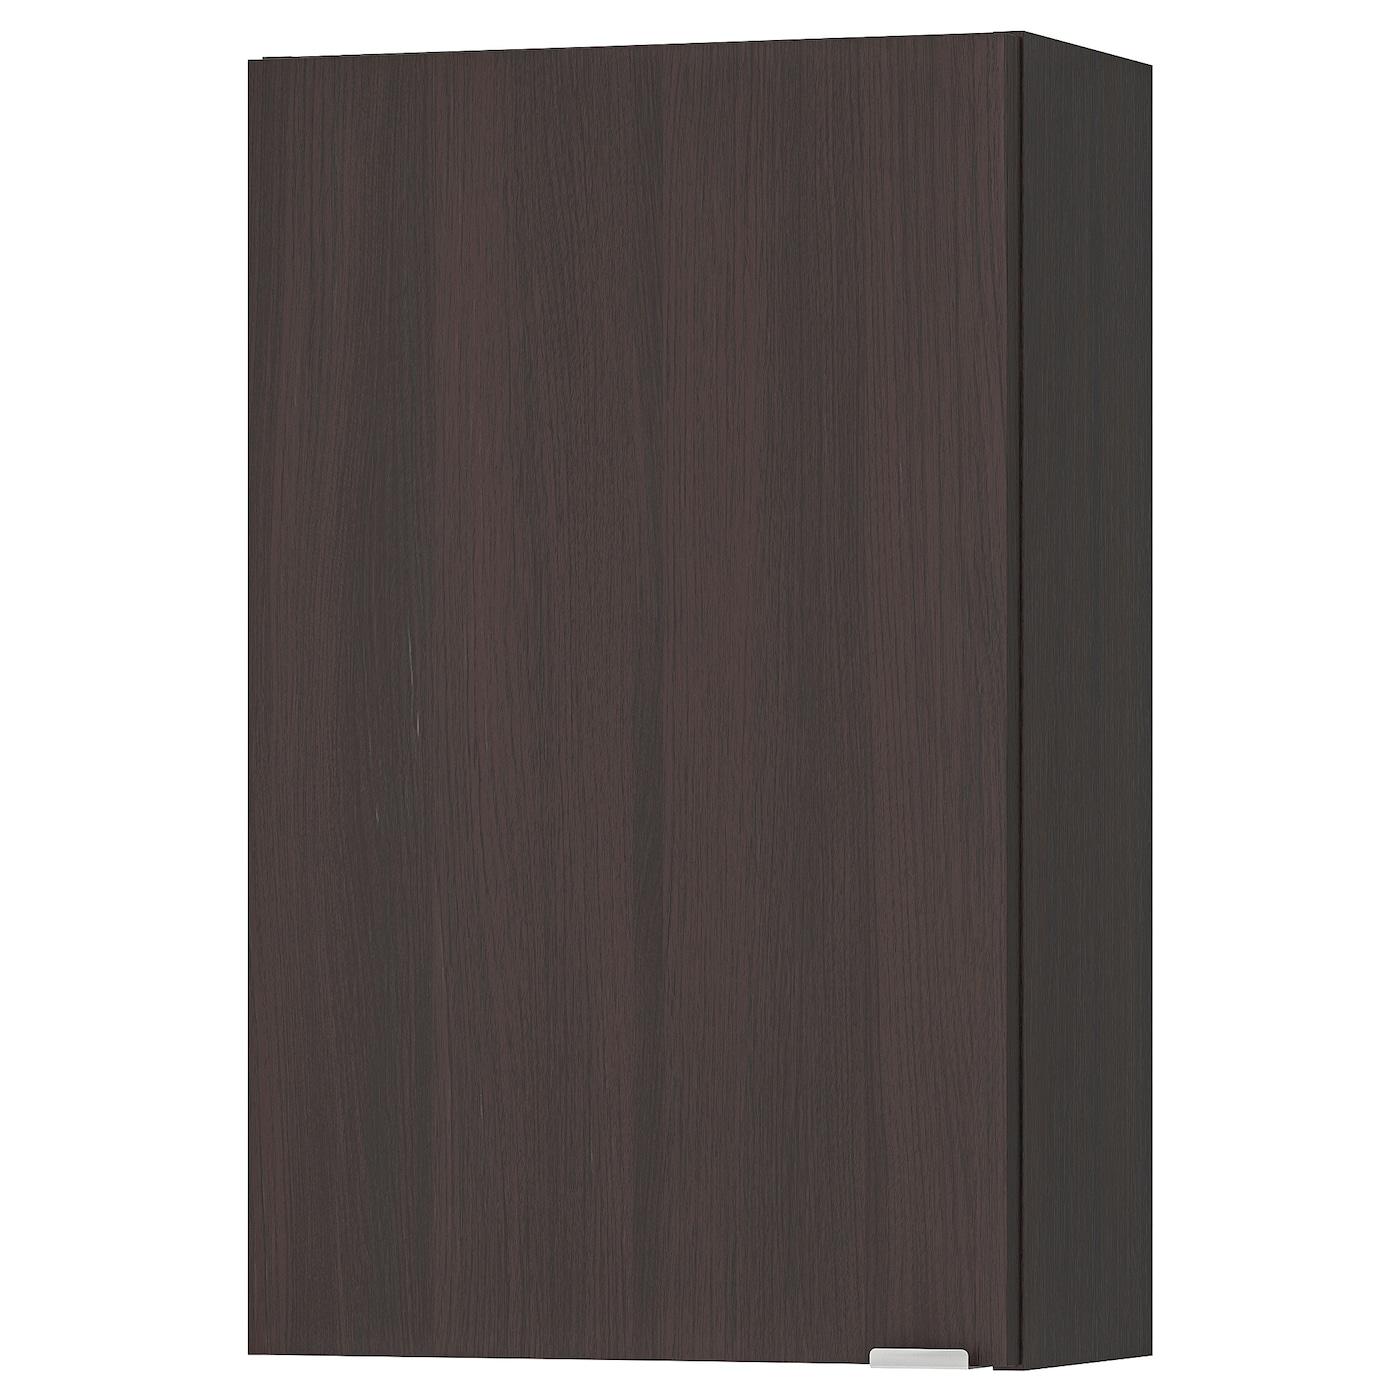 LillÅngen Wall Cabinet Black Brown Ikea